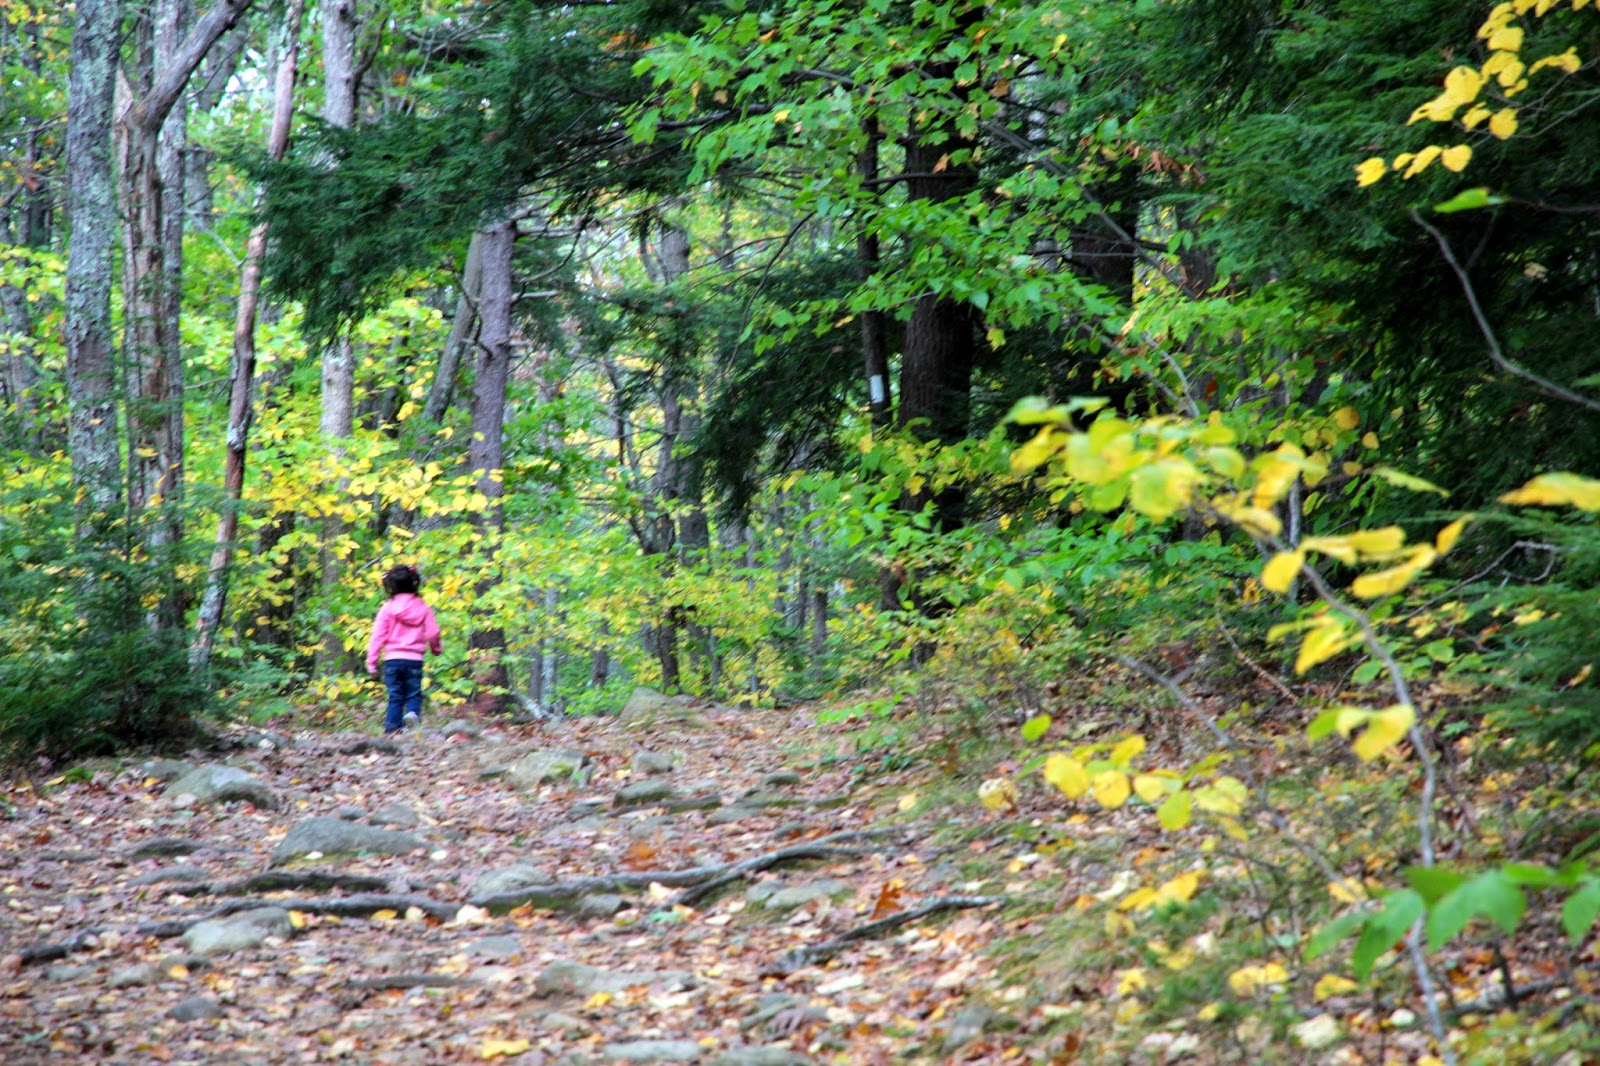 day hiking trails great activity for day hiking kids color find. Black Bedroom Furniture Sets. Home Design Ideas